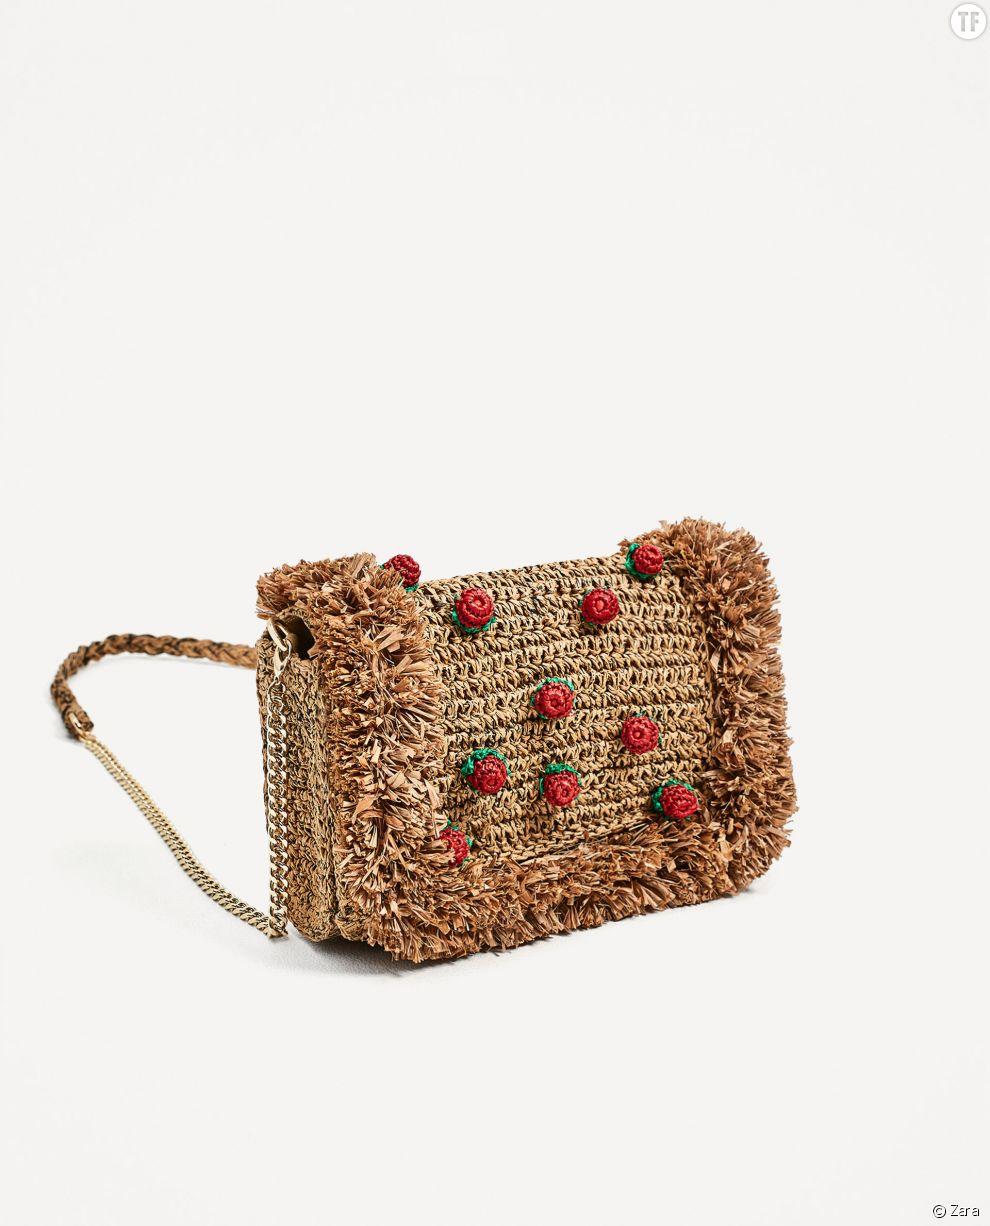 Sac à main en raphia Zara, 29,99€